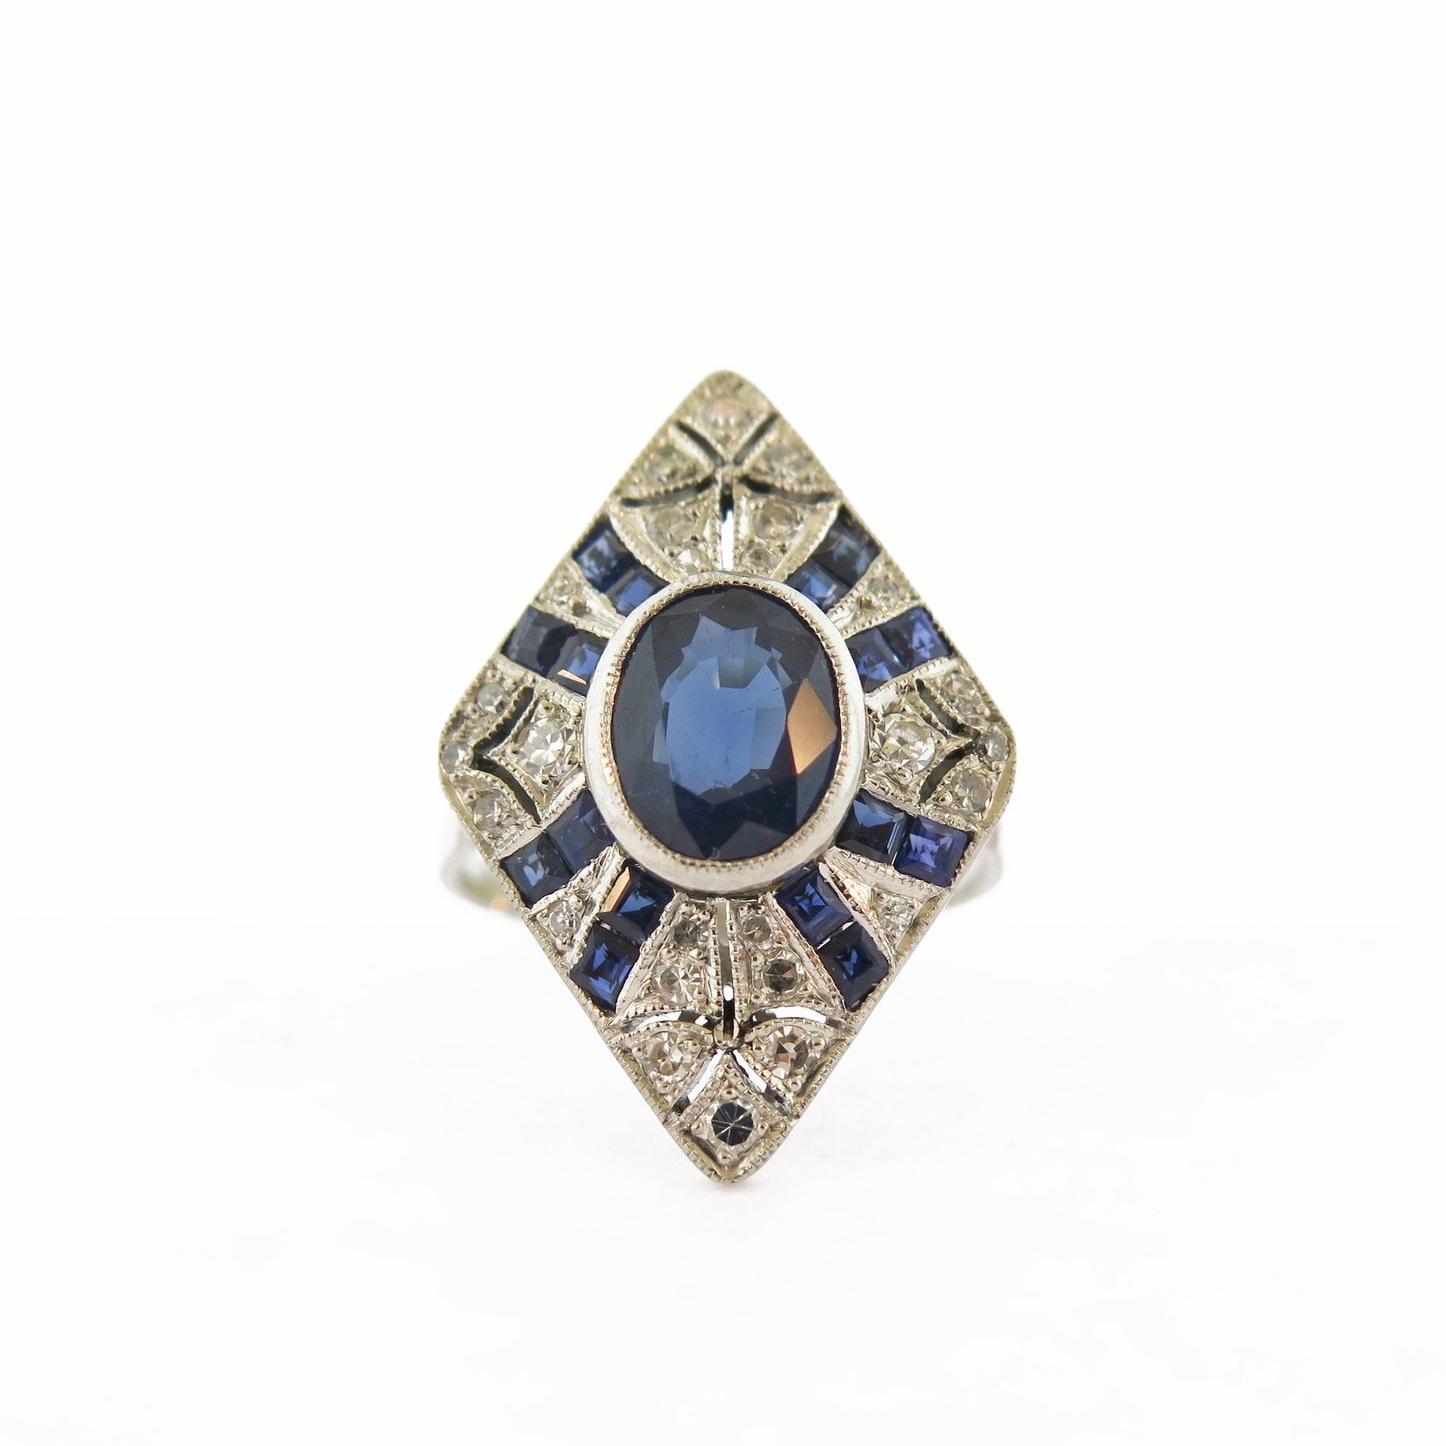 20th Century Diamond and Sapphire Platinum Ring